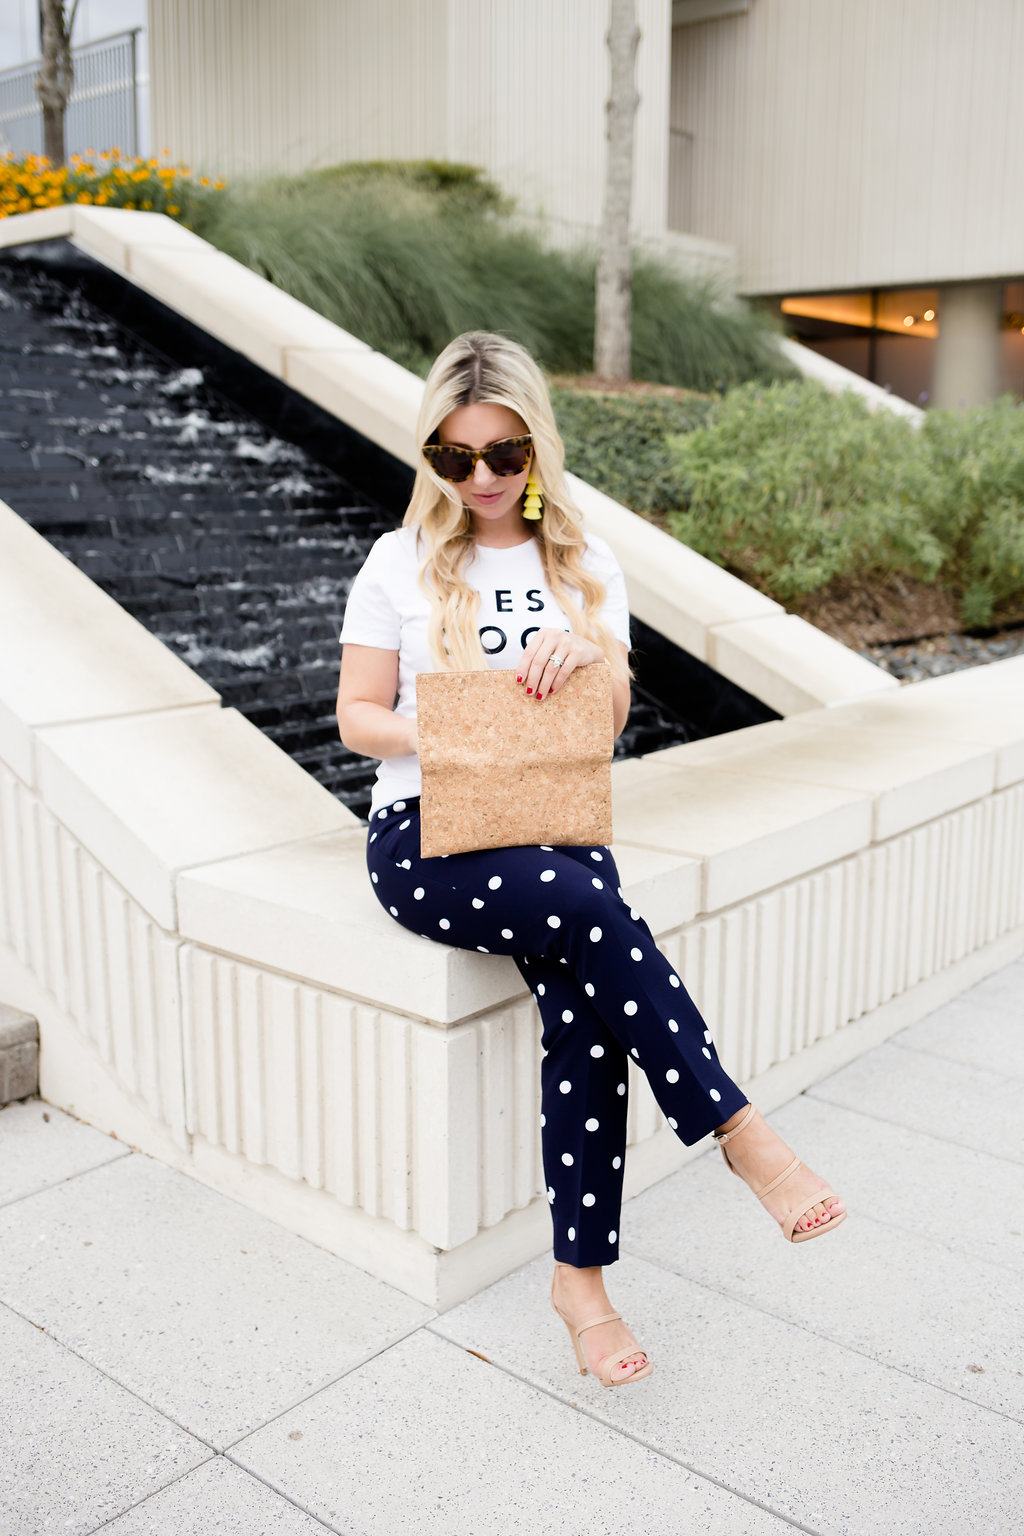 Fancy Pants, Workwear With A Twist | Polkadots | The Darling Petite Diva